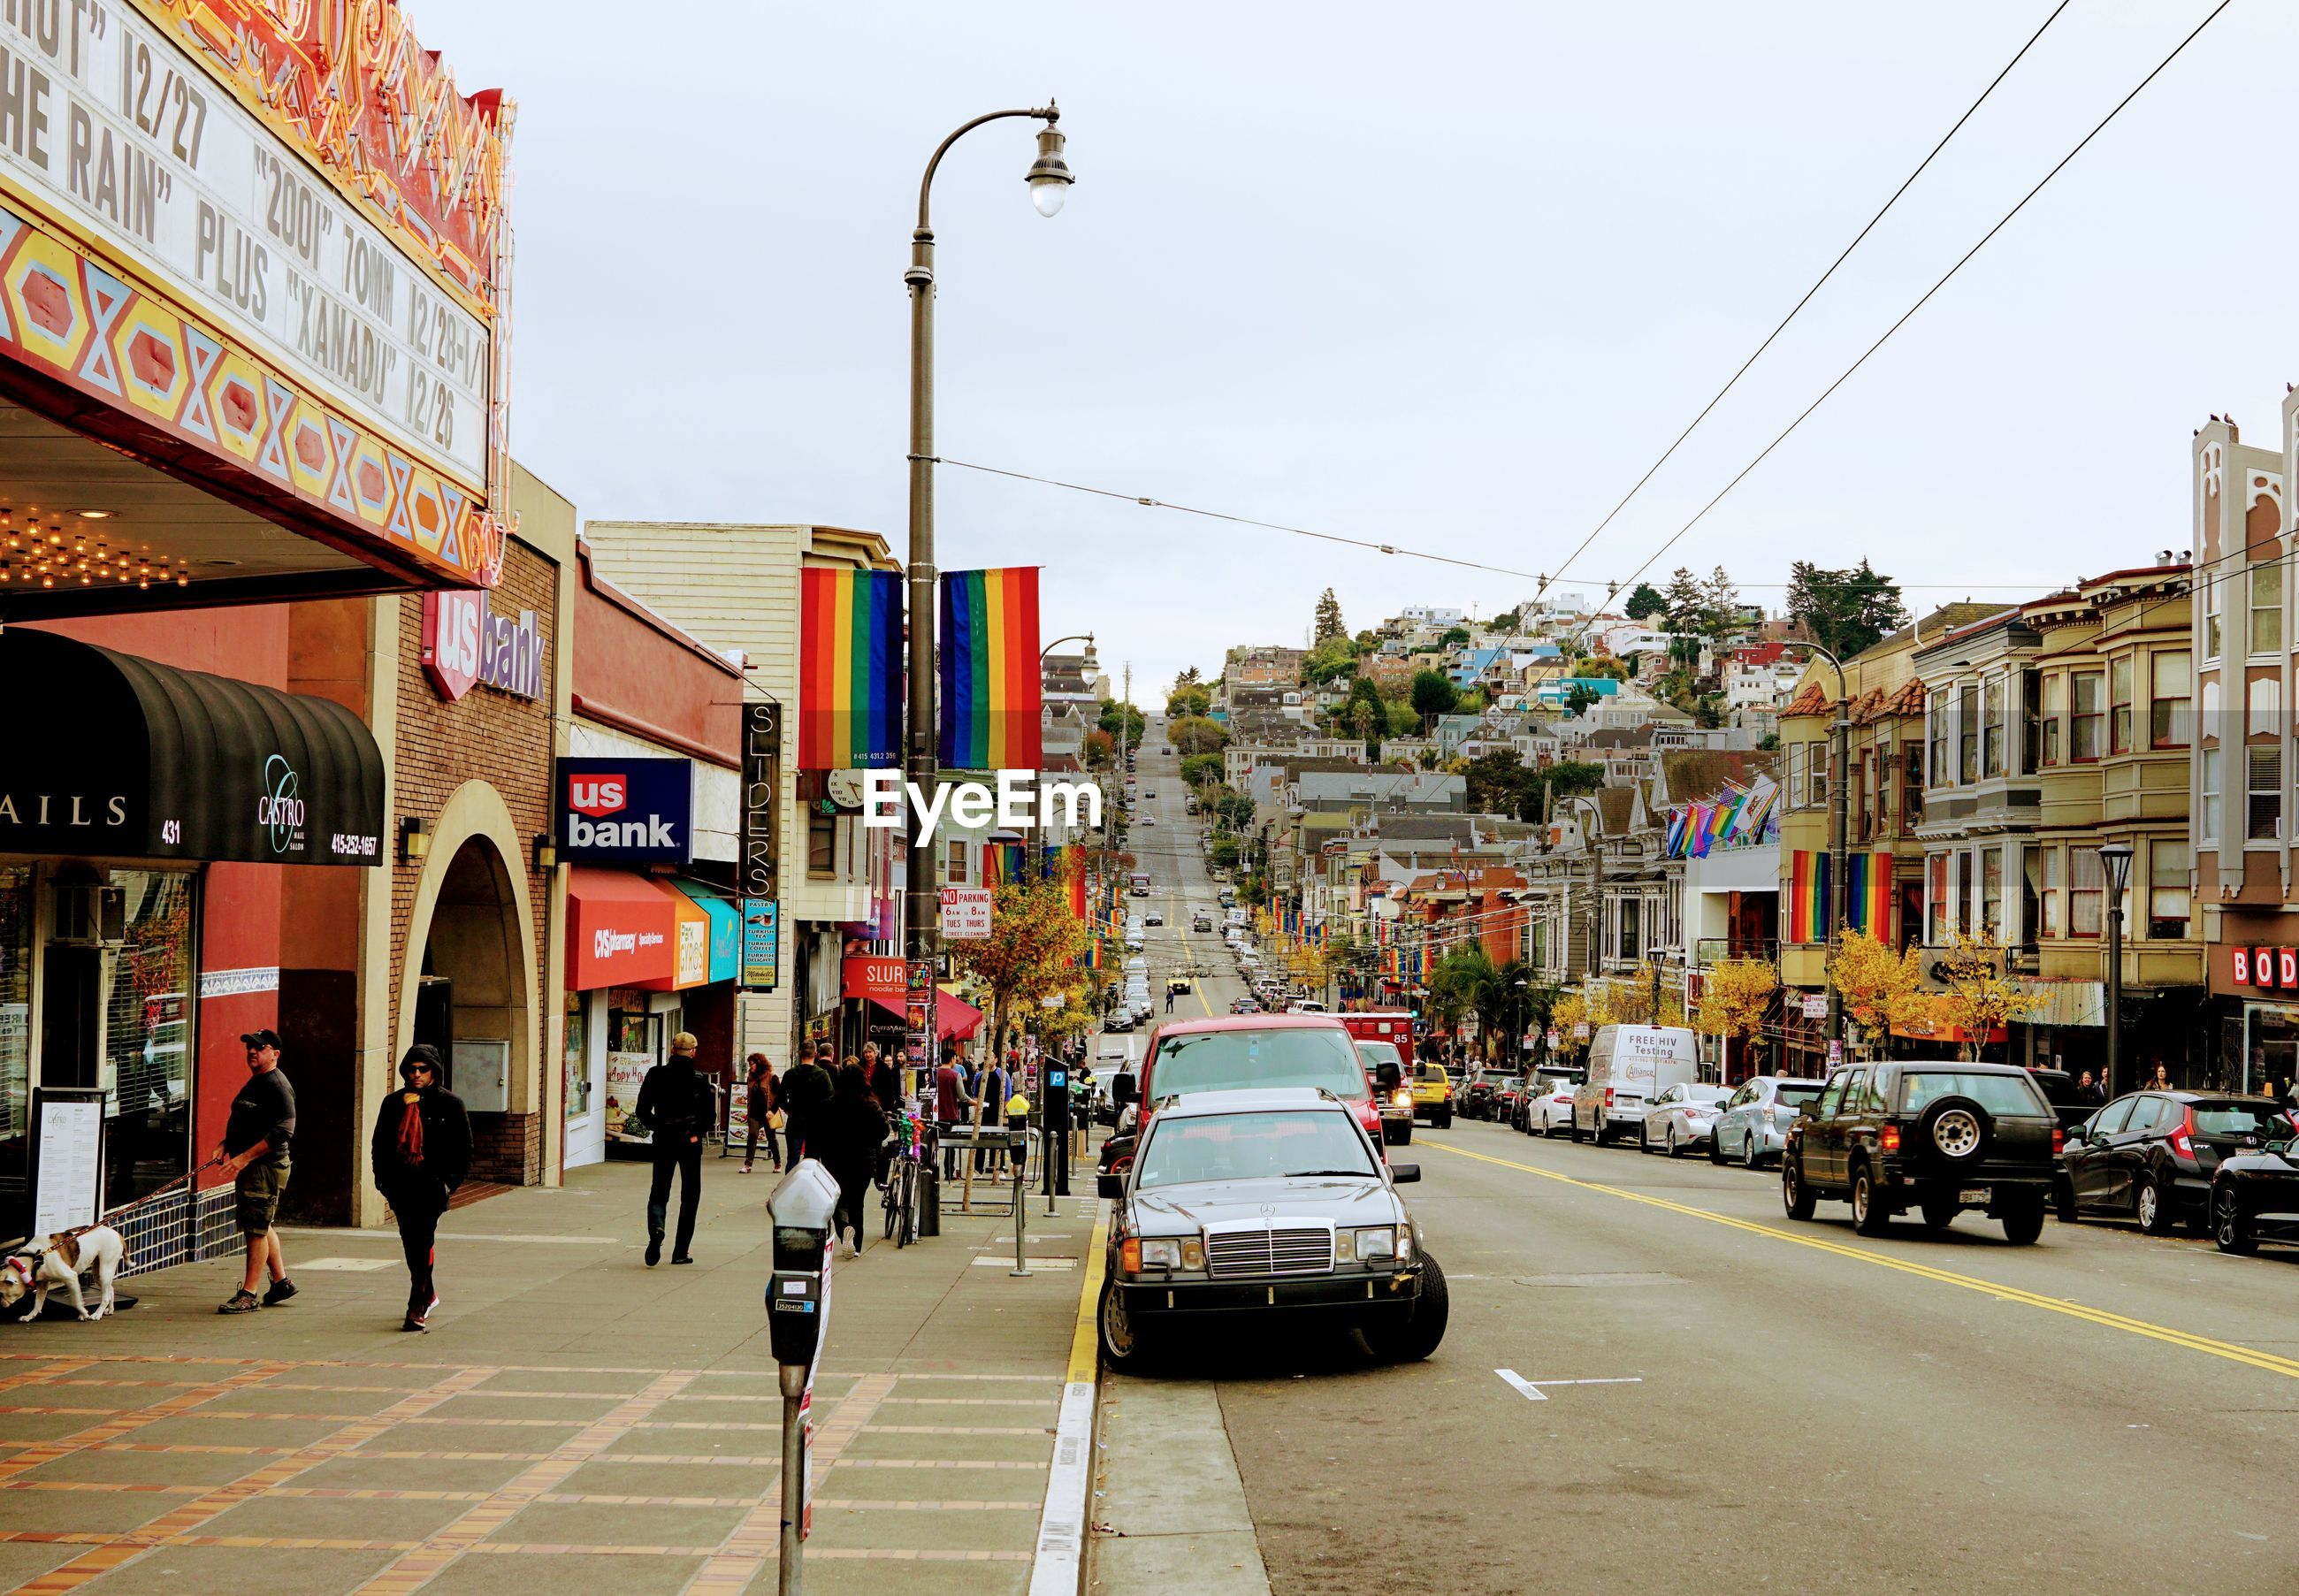 CARS ON CITY STREET AGAINST BUILDINGS